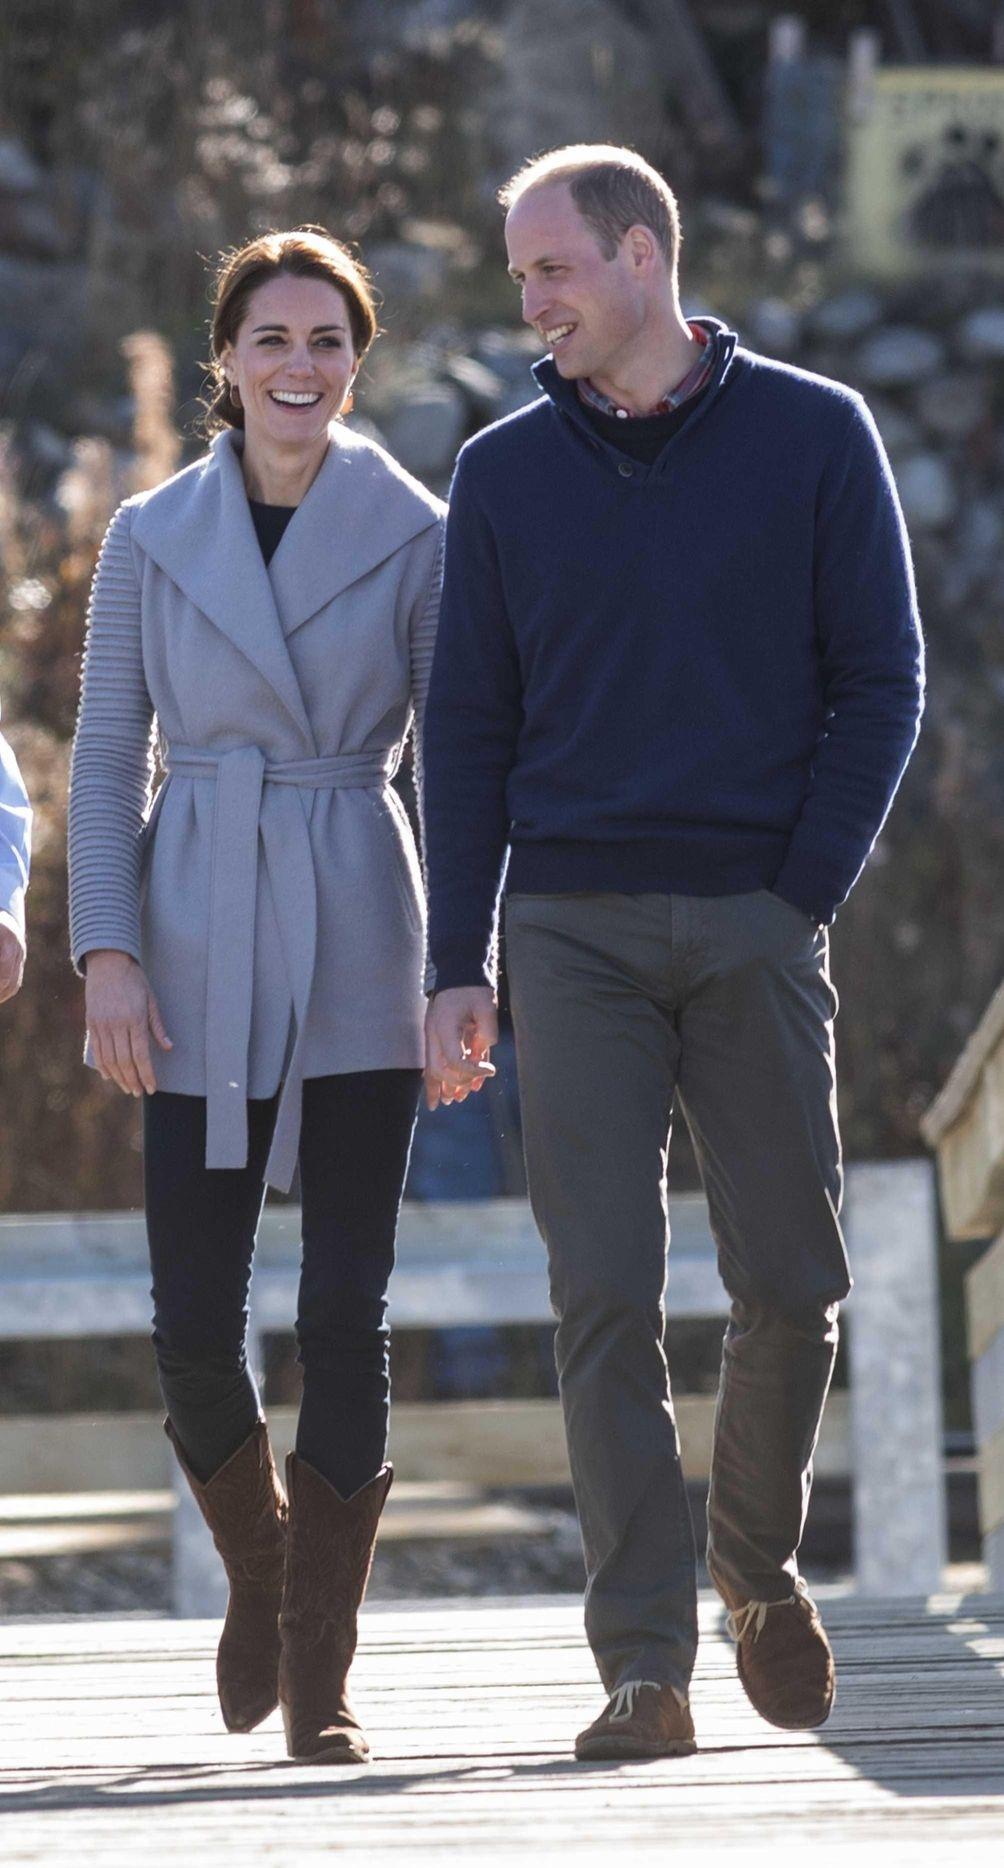 Prince William, Duke of Cambridge and Catherine, Duchess